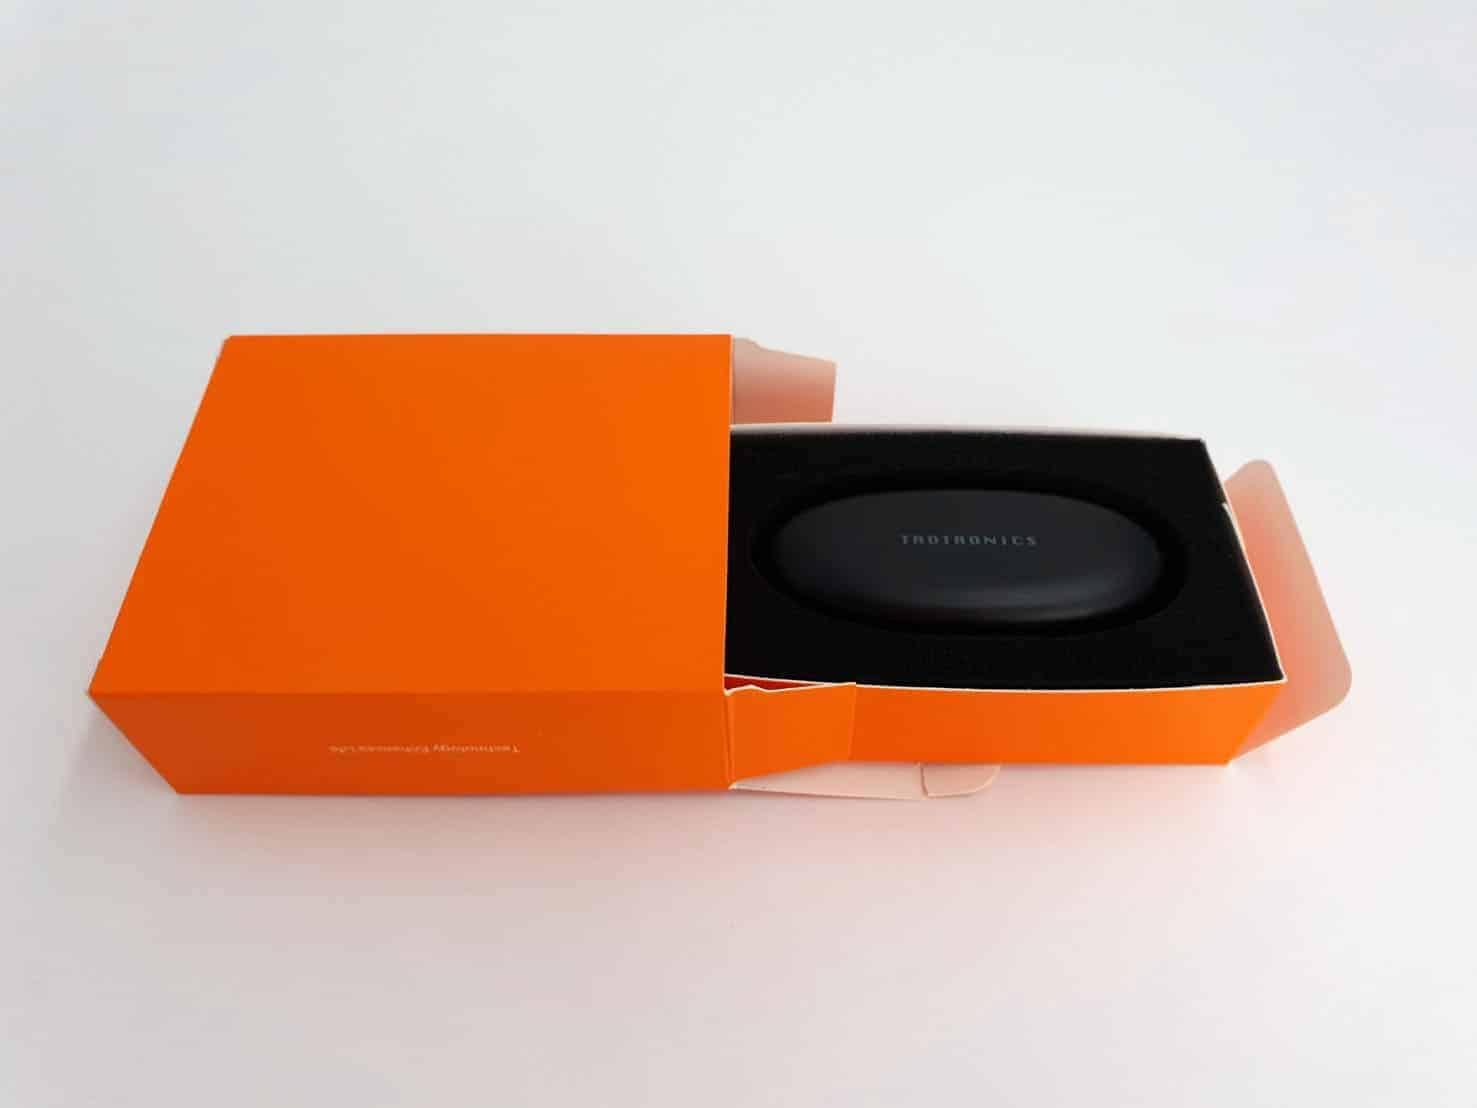 TaoTroncis TT-BH053真無線藍牙耳機推薦 內裝